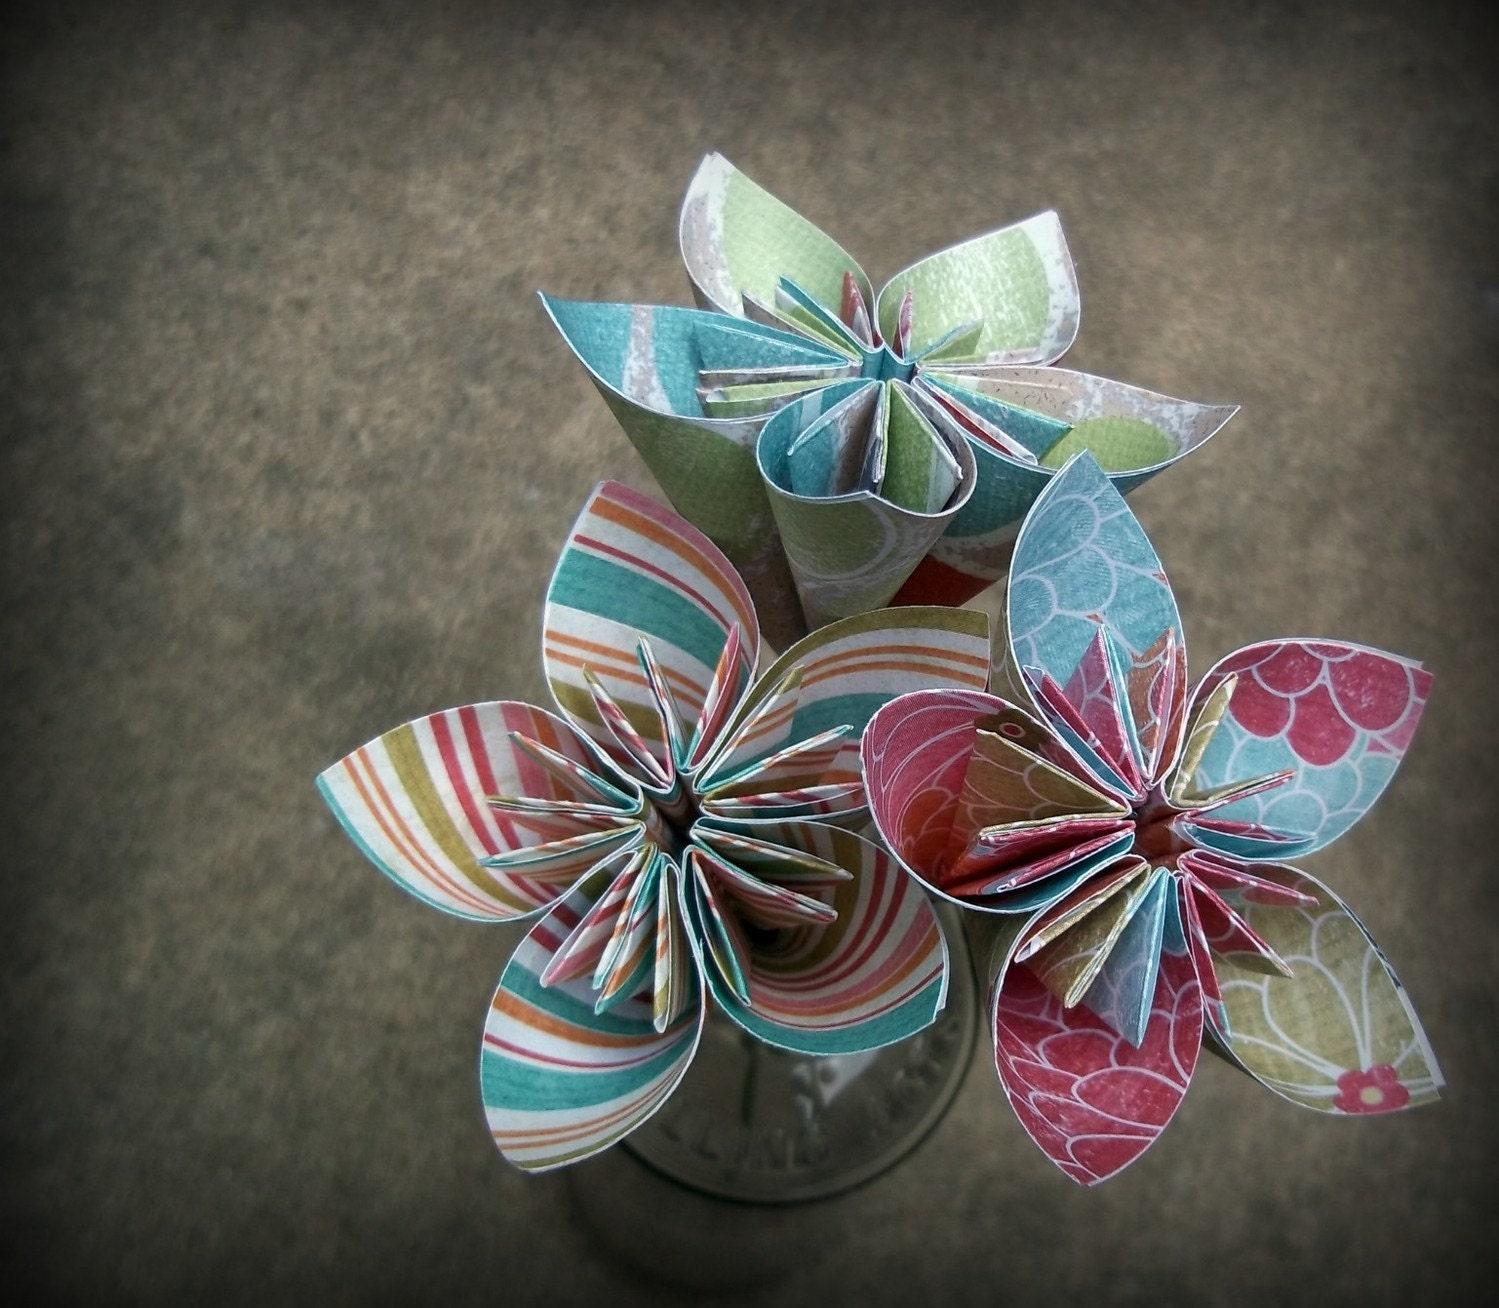 Mini Origami Paper Flower Bouquet. 3 Origami Paper Flowers. - photo#24